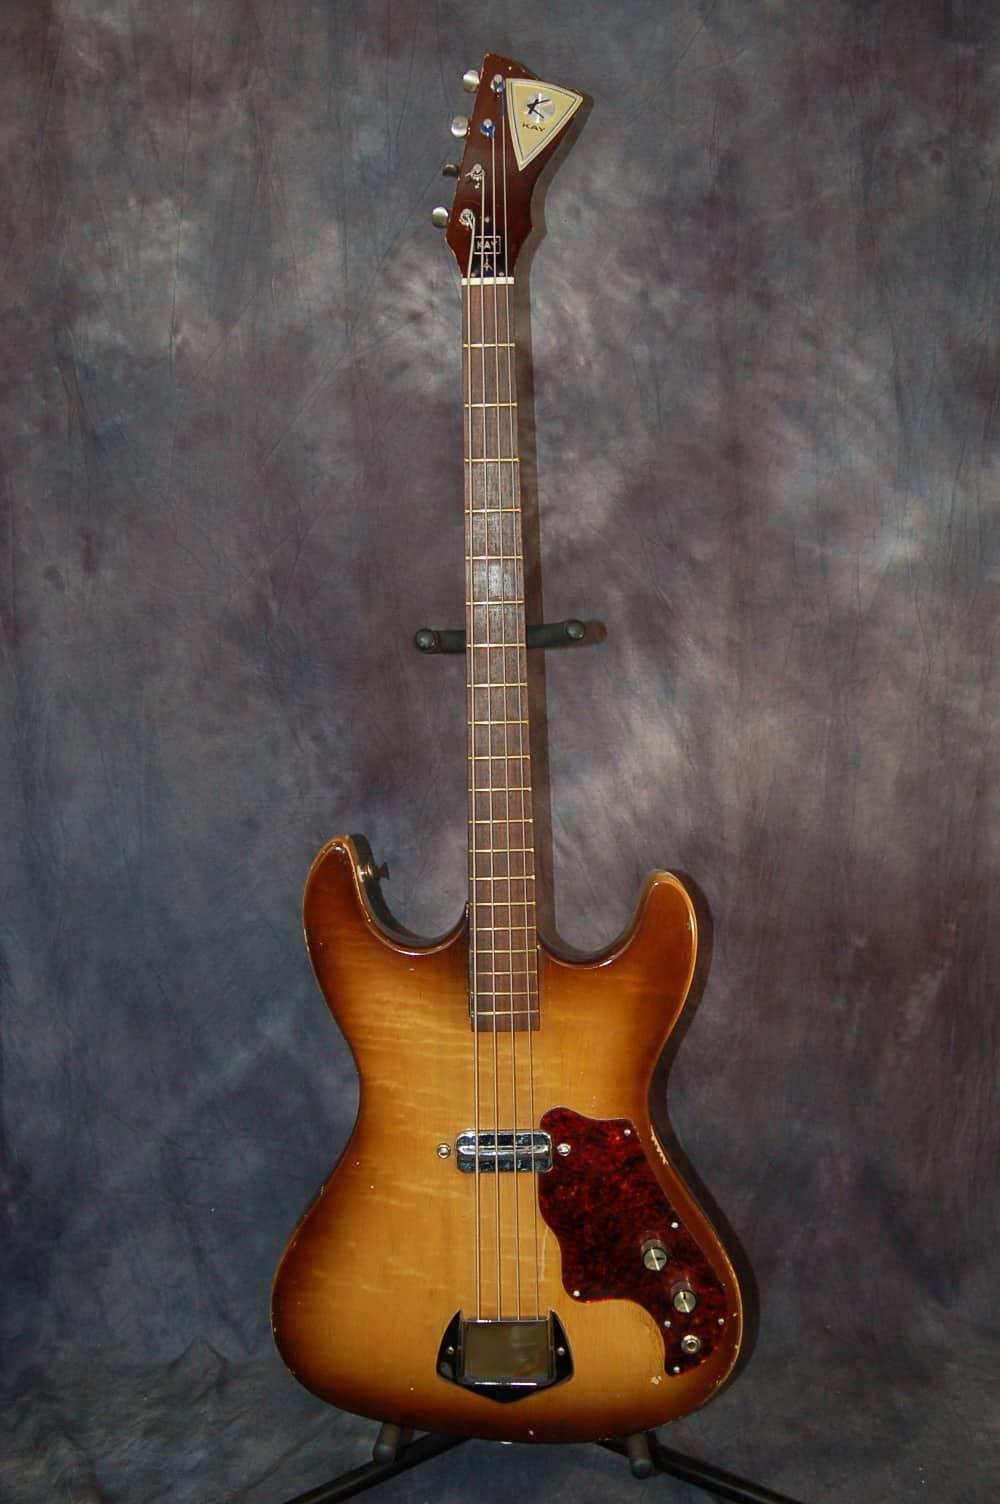 video demo rare kay model k5930 bass guitar speed bump pickup reverb. Black Bedroom Furniture Sets. Home Design Ideas